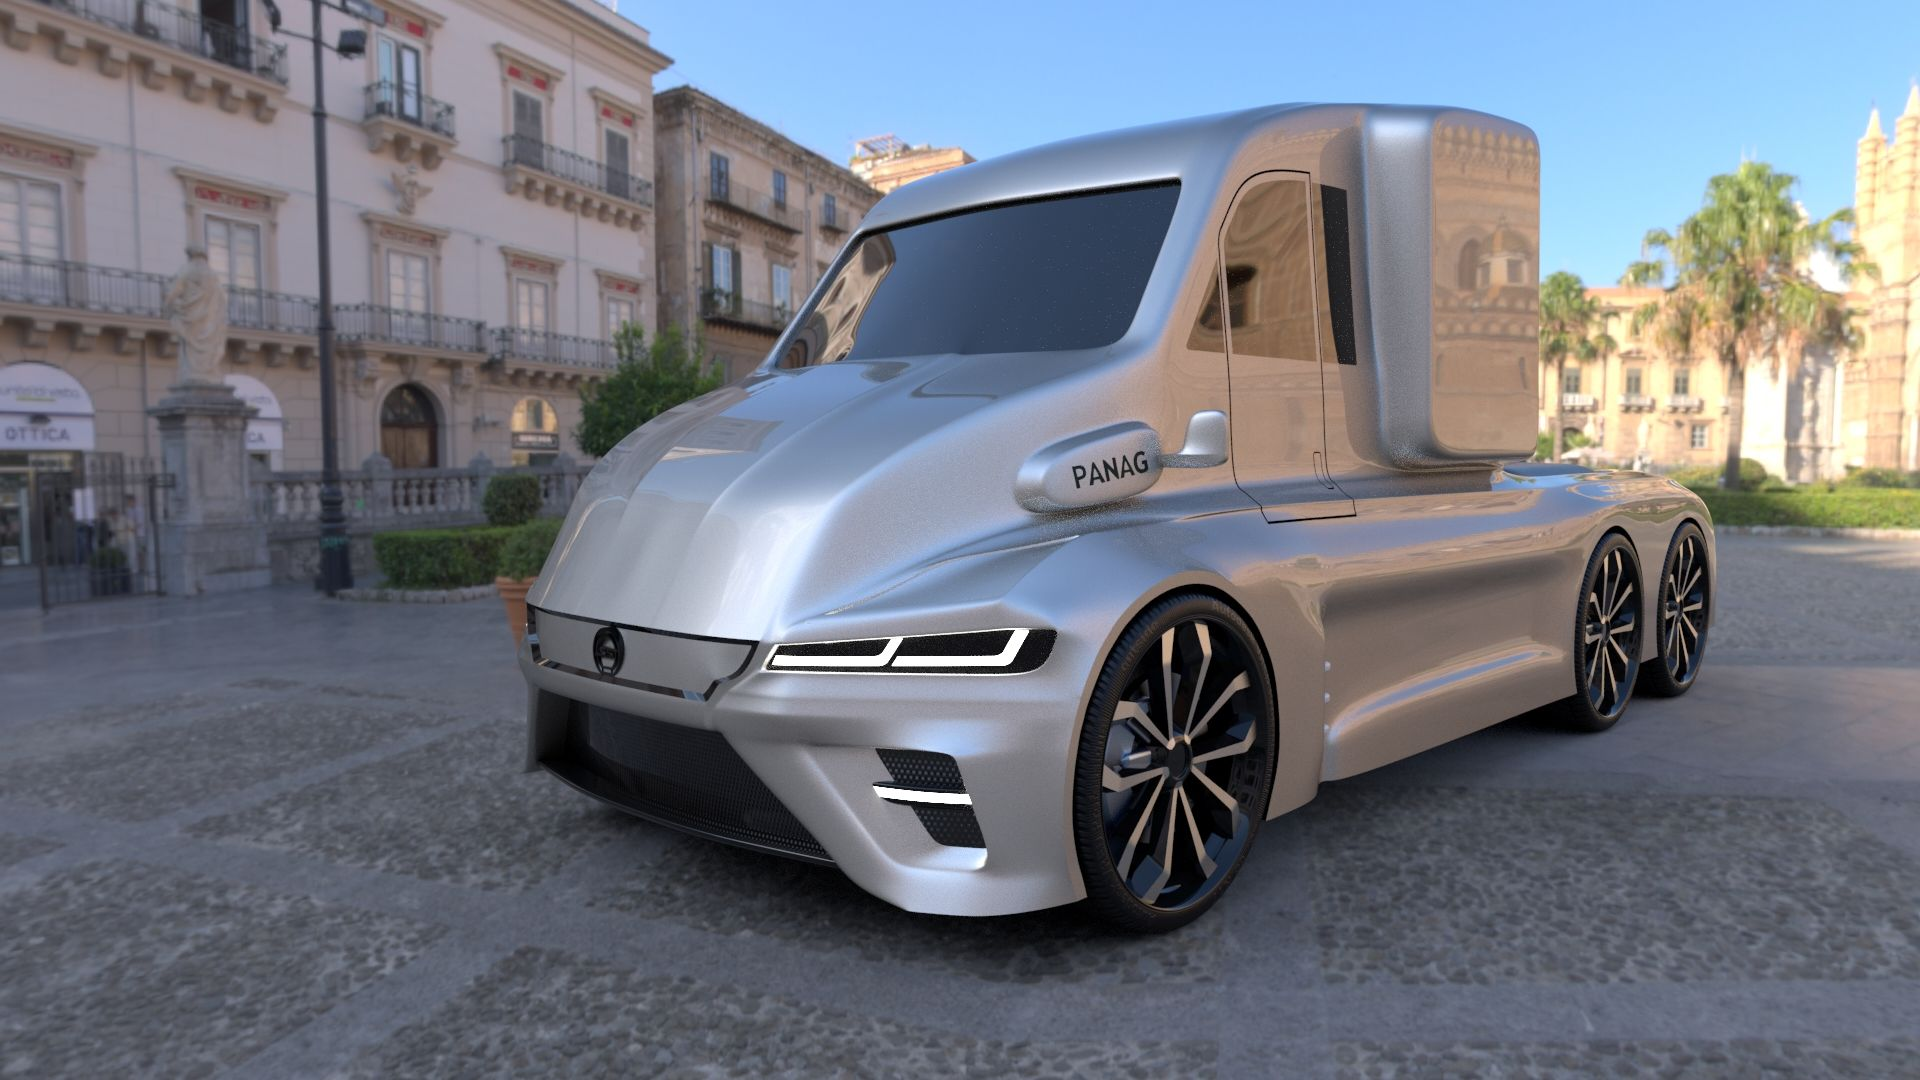 Truck6-3500-3500